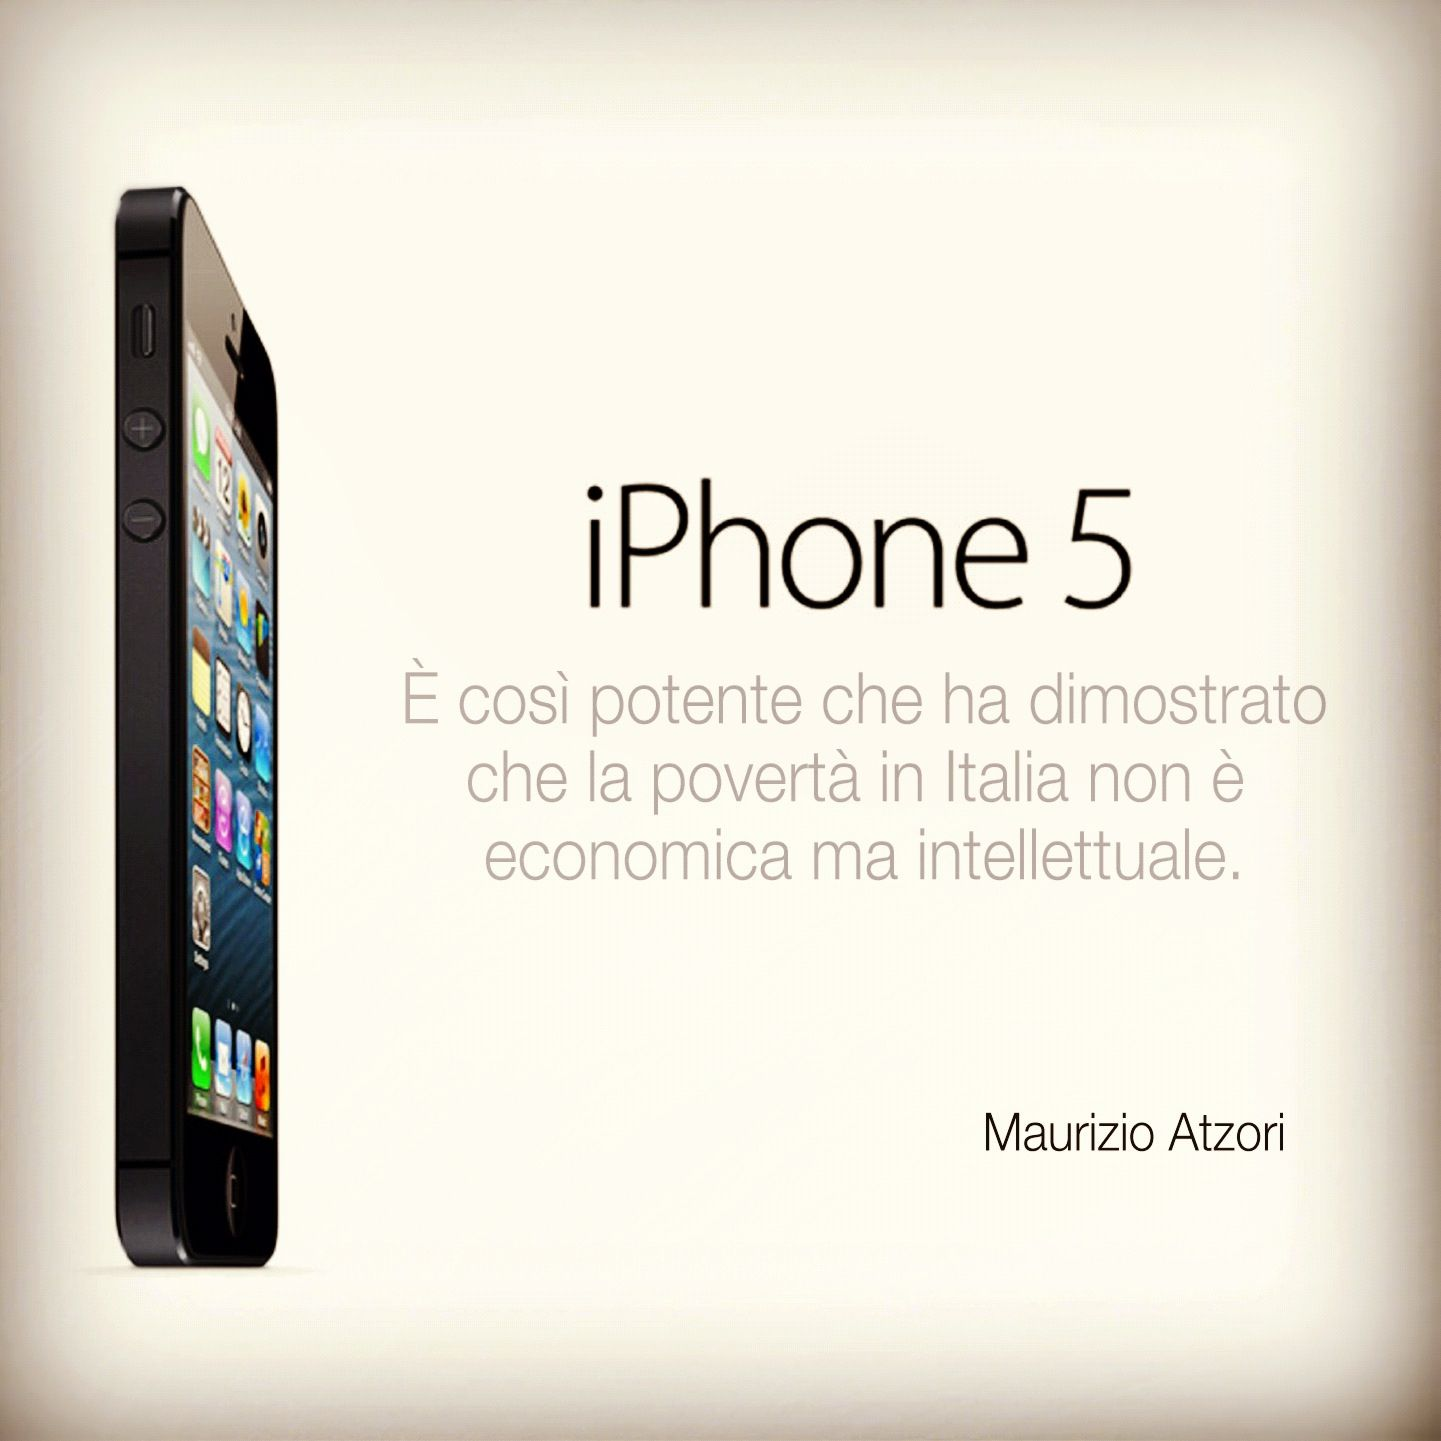 iPhone 5... By Maurizio Atzori